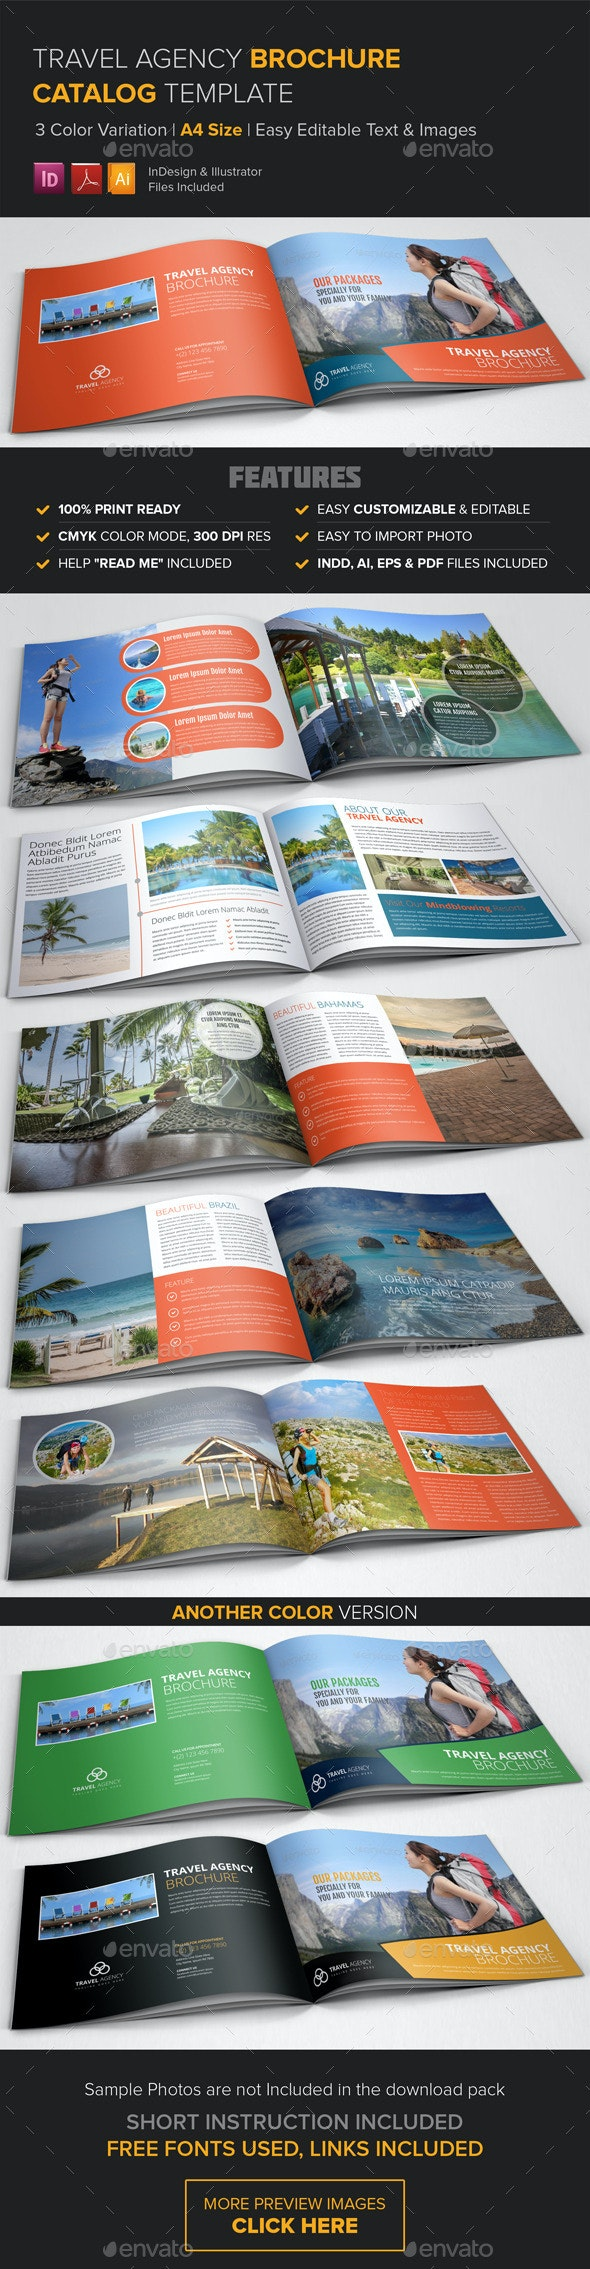 Travel Agency Brochure Catalog Template  - Corporate Brochures